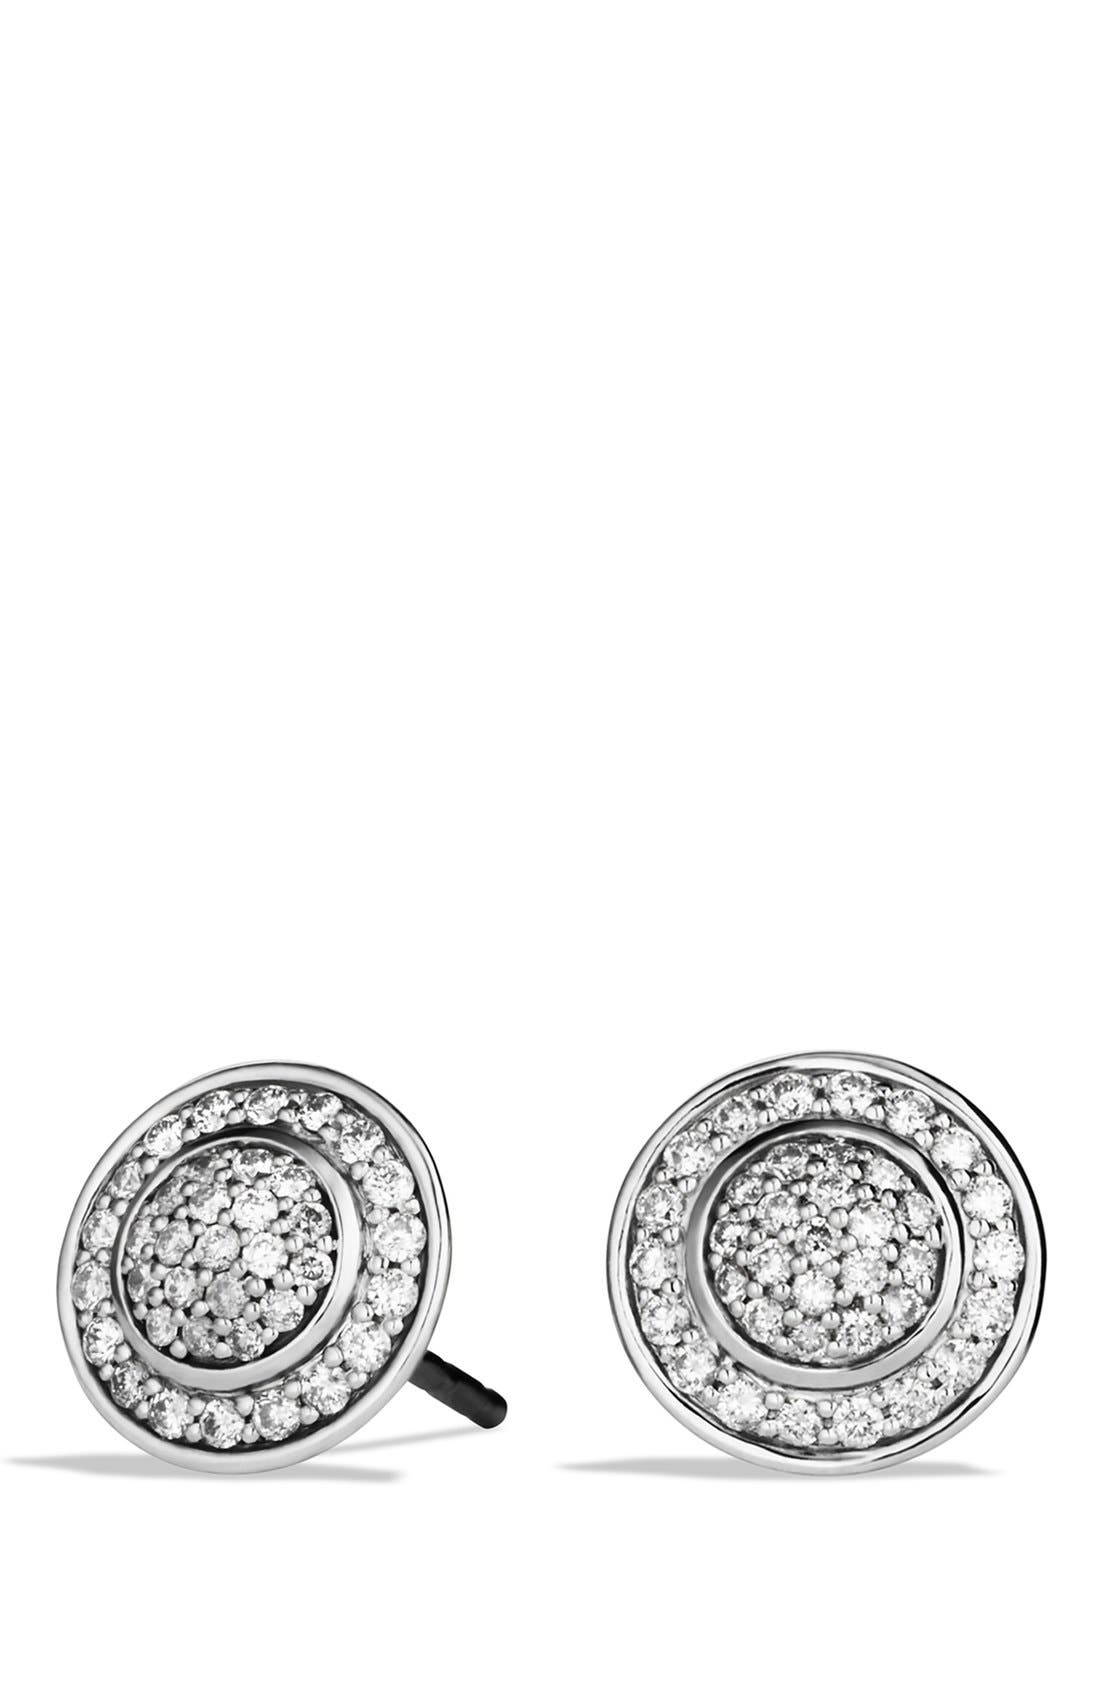 Main Image - David Yurman 'Cerise' Mini Earrings with Diamonds